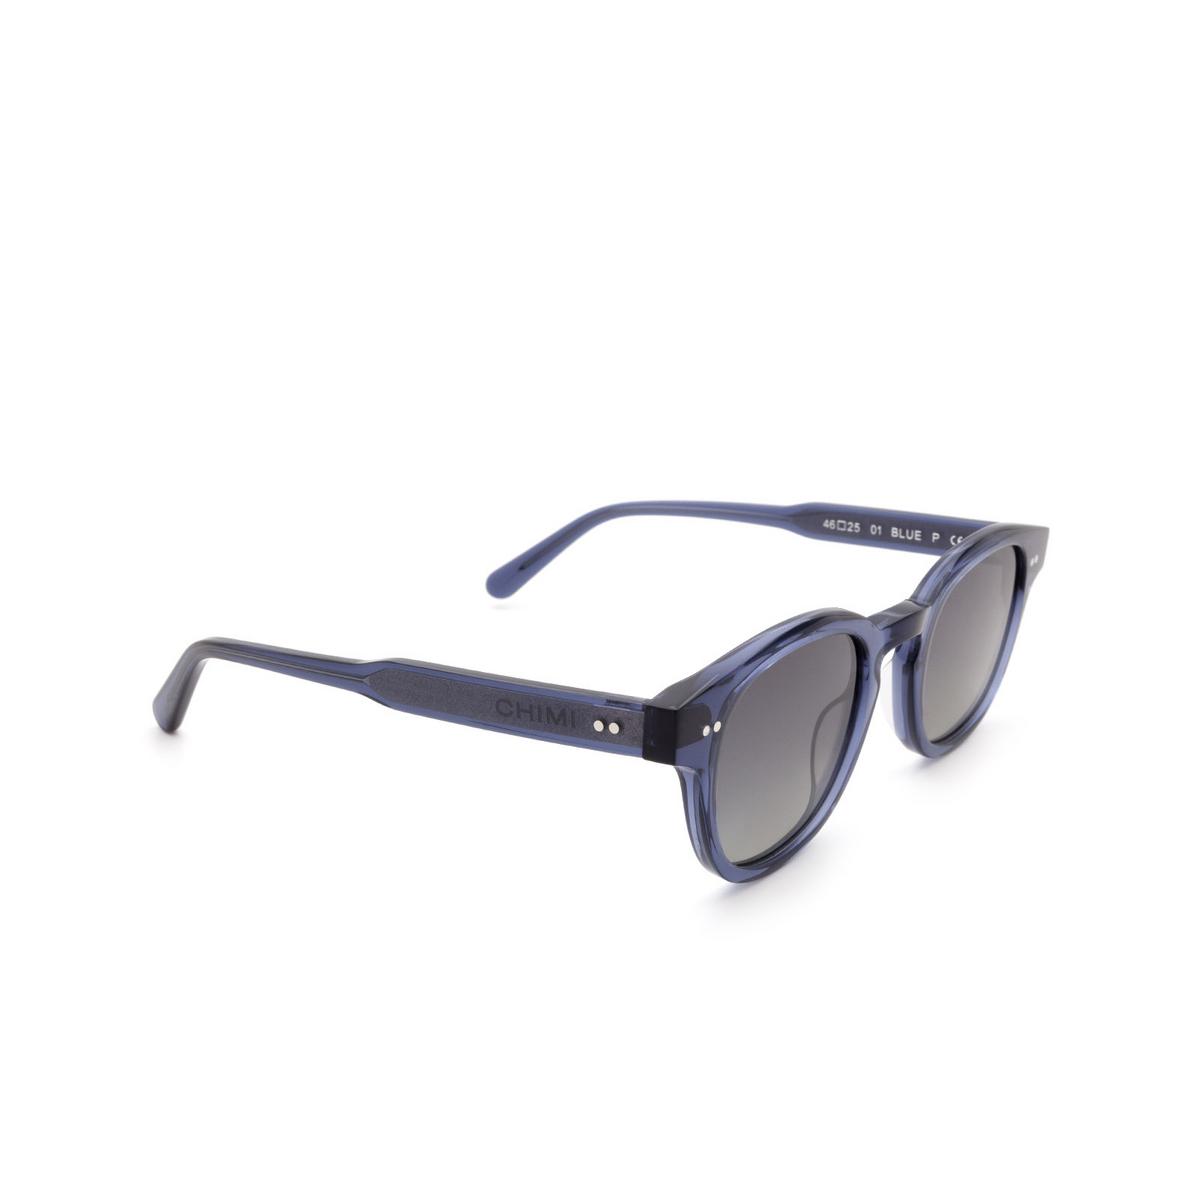 Chimi® Square Sunglasses: 01 color Blue - three-quarters view.